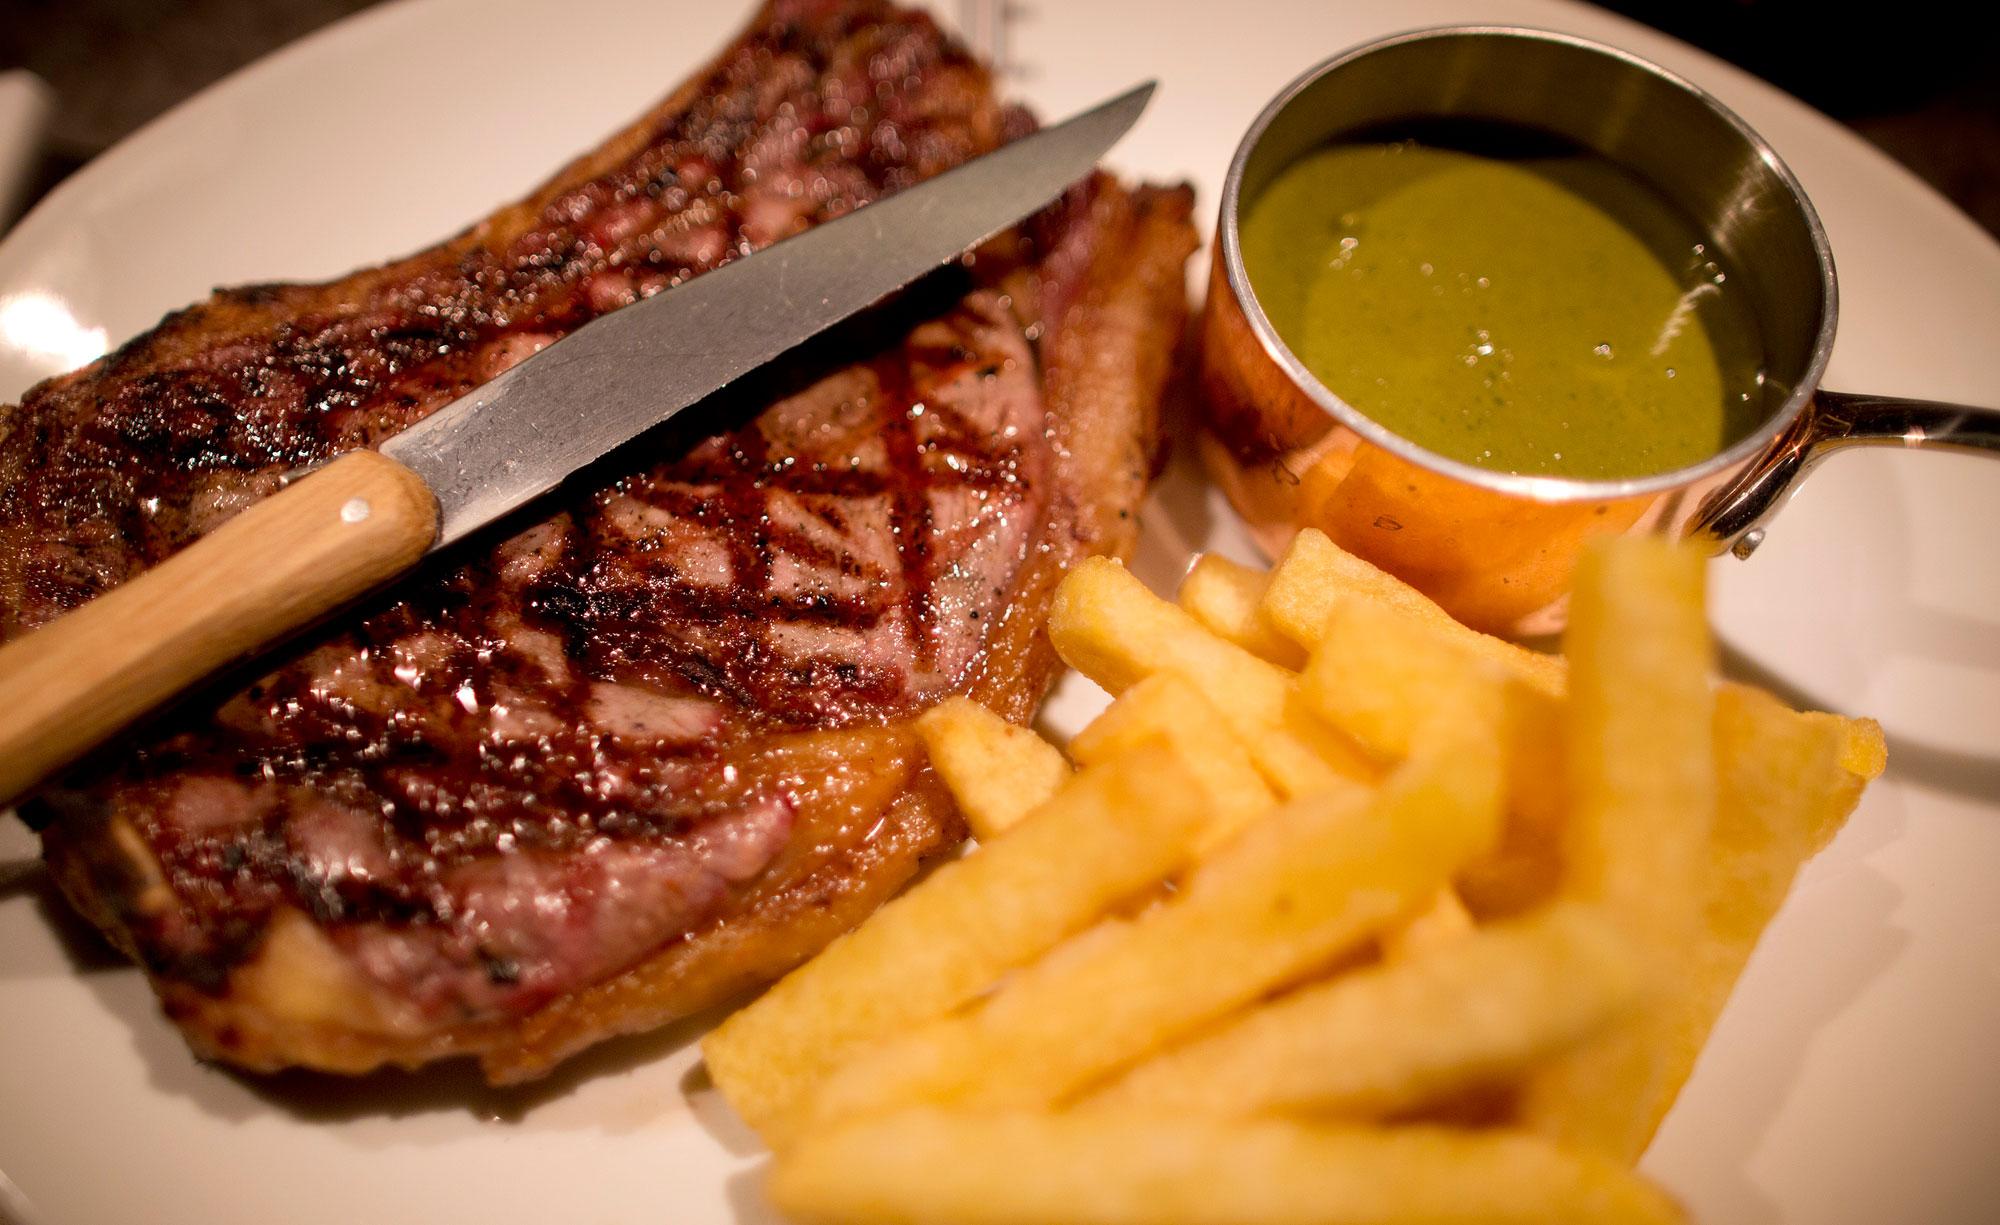 Orange Elephant: Incredible Steak That's Elegant In Its Simplicity 7